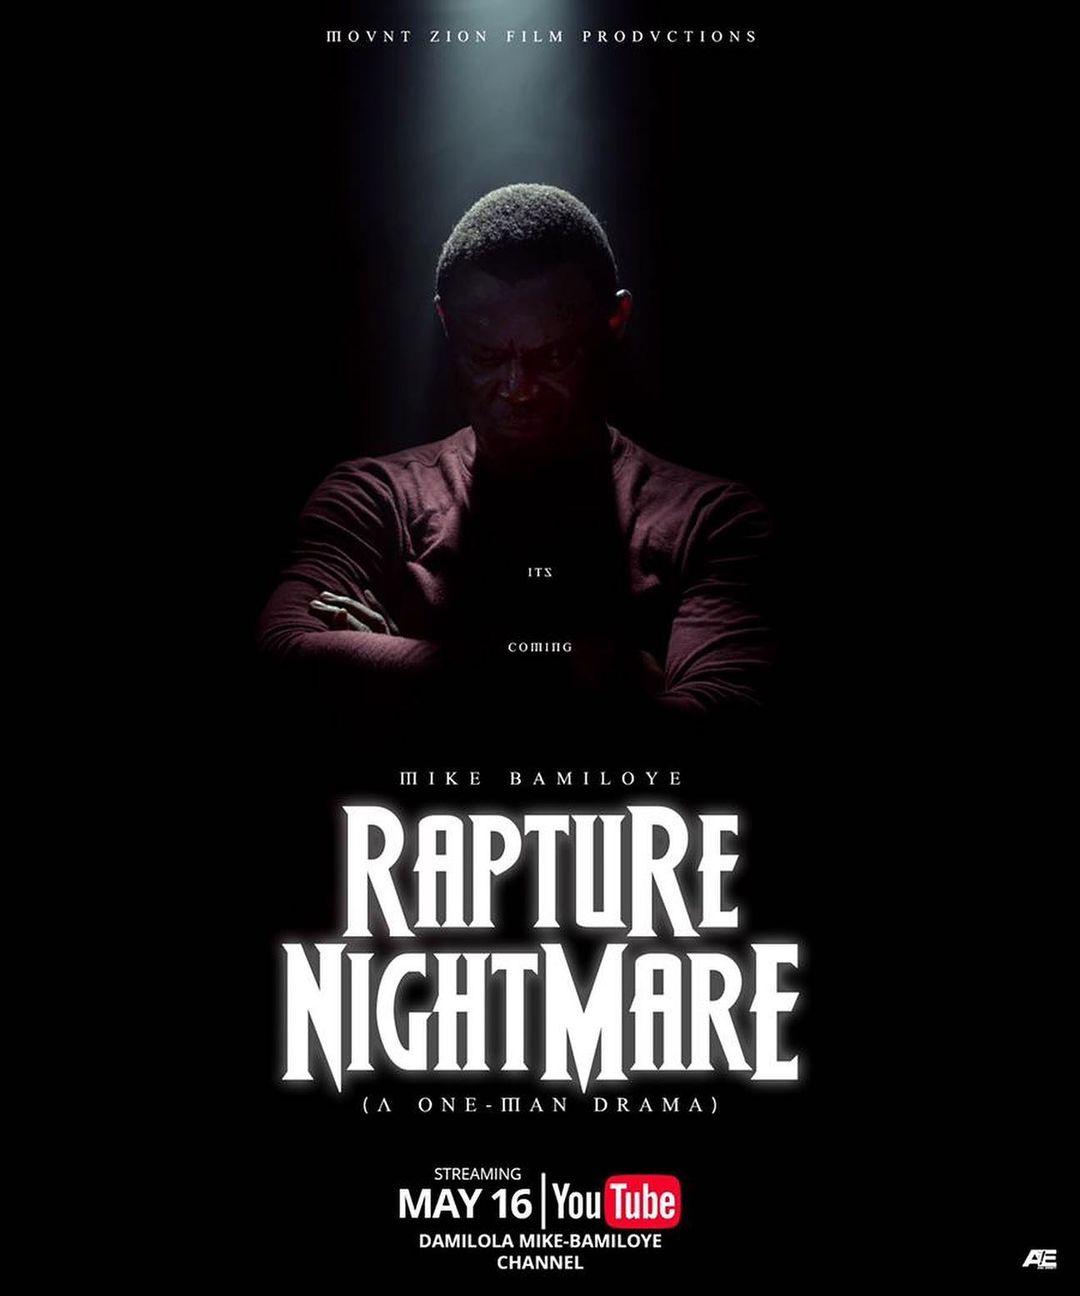 Rapture Nightmare - Mount Zion Film Productions